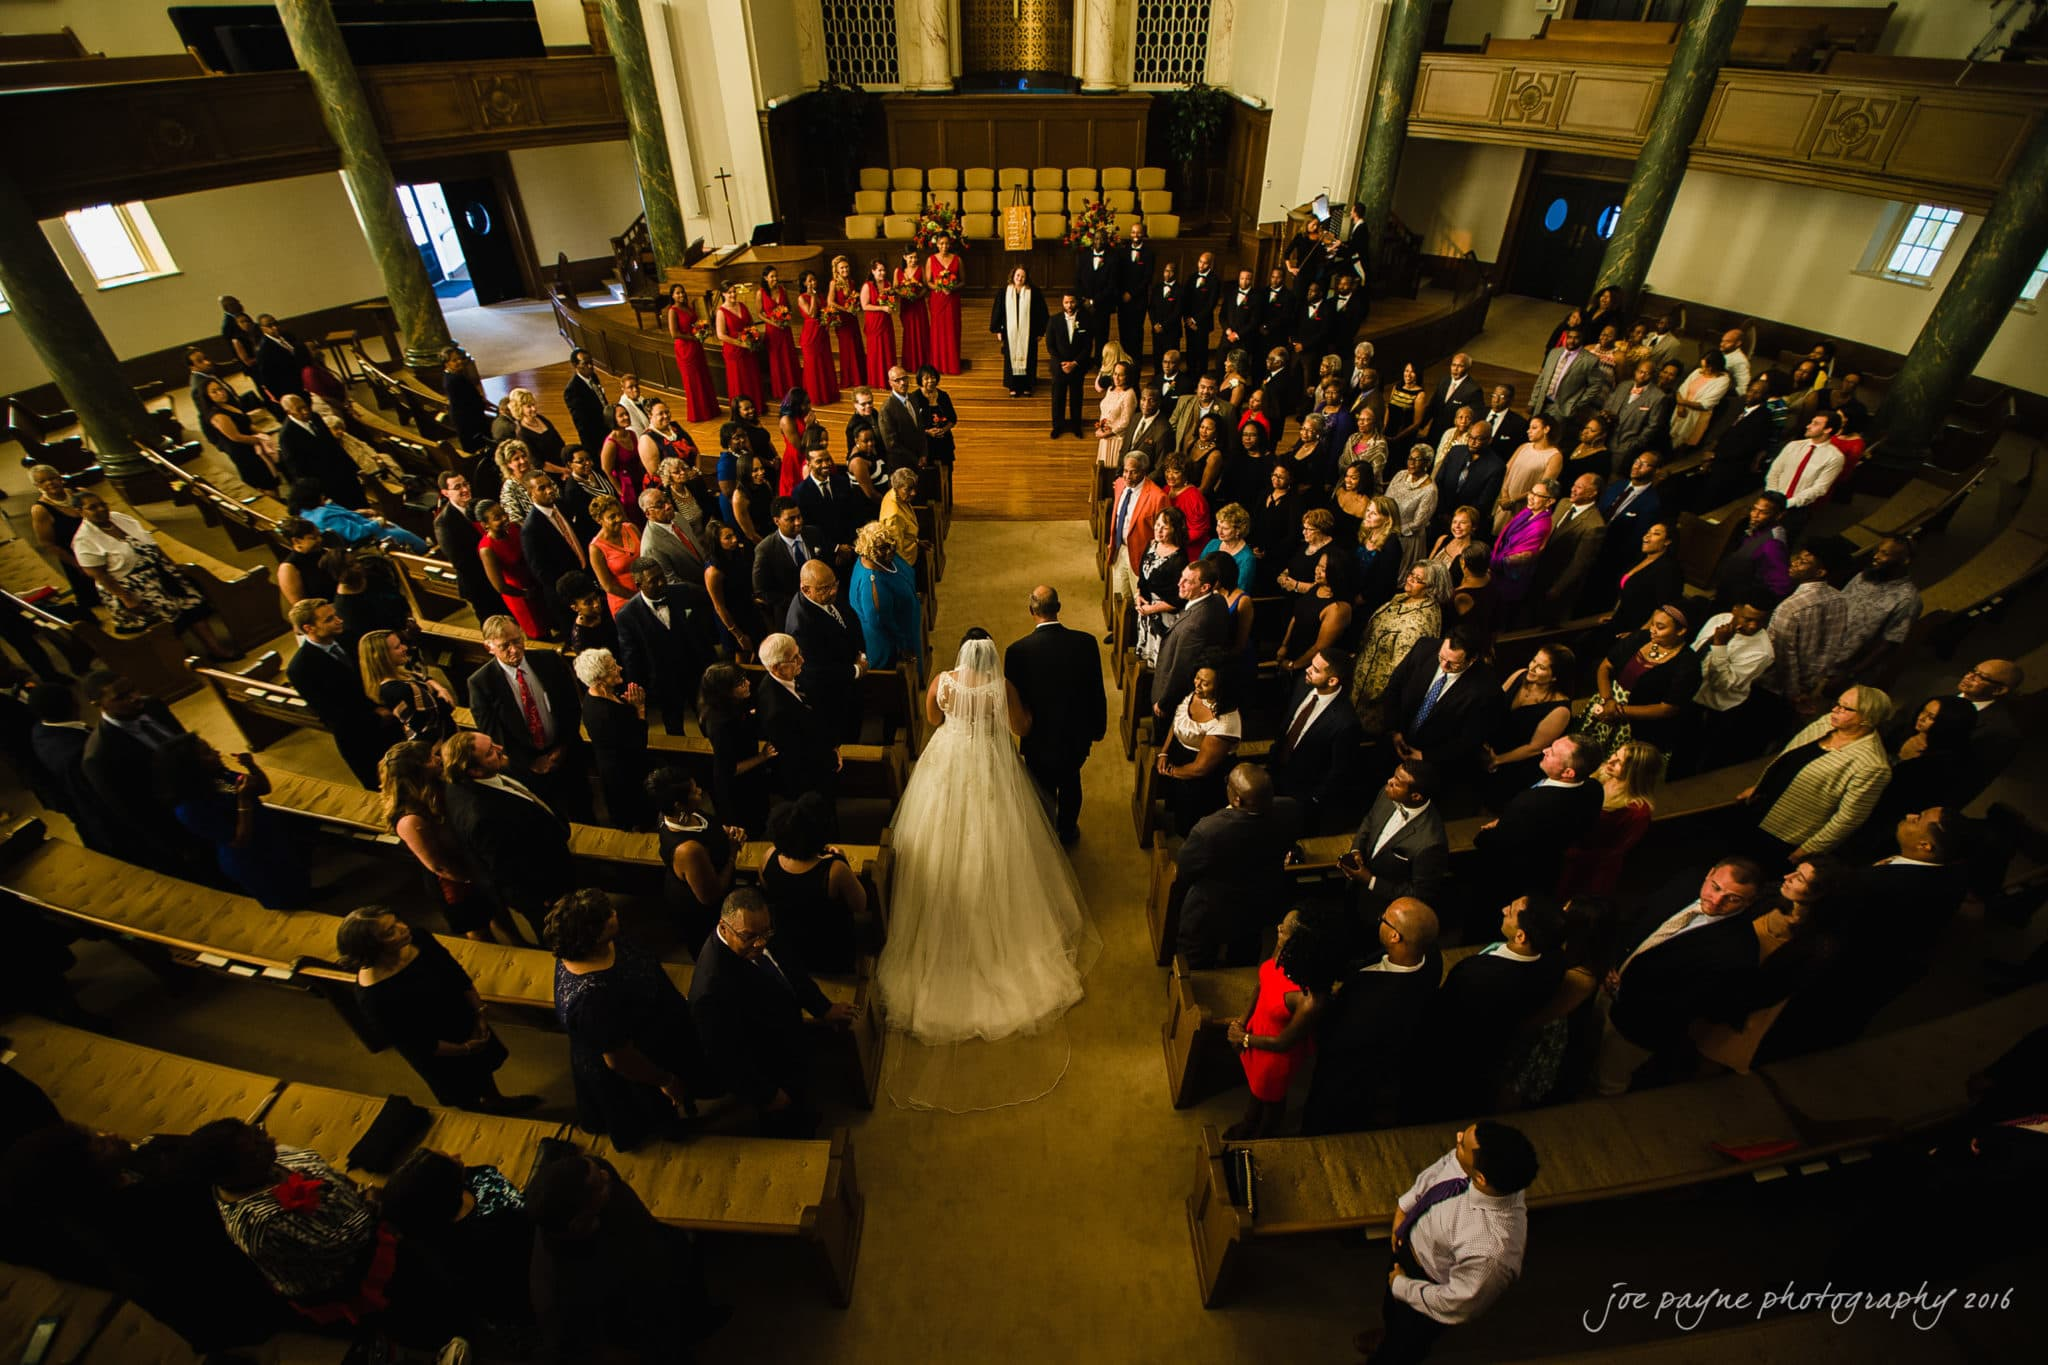 first-baptist-millennium-center-winston-salem-wedding-photography-toni-kevin-13